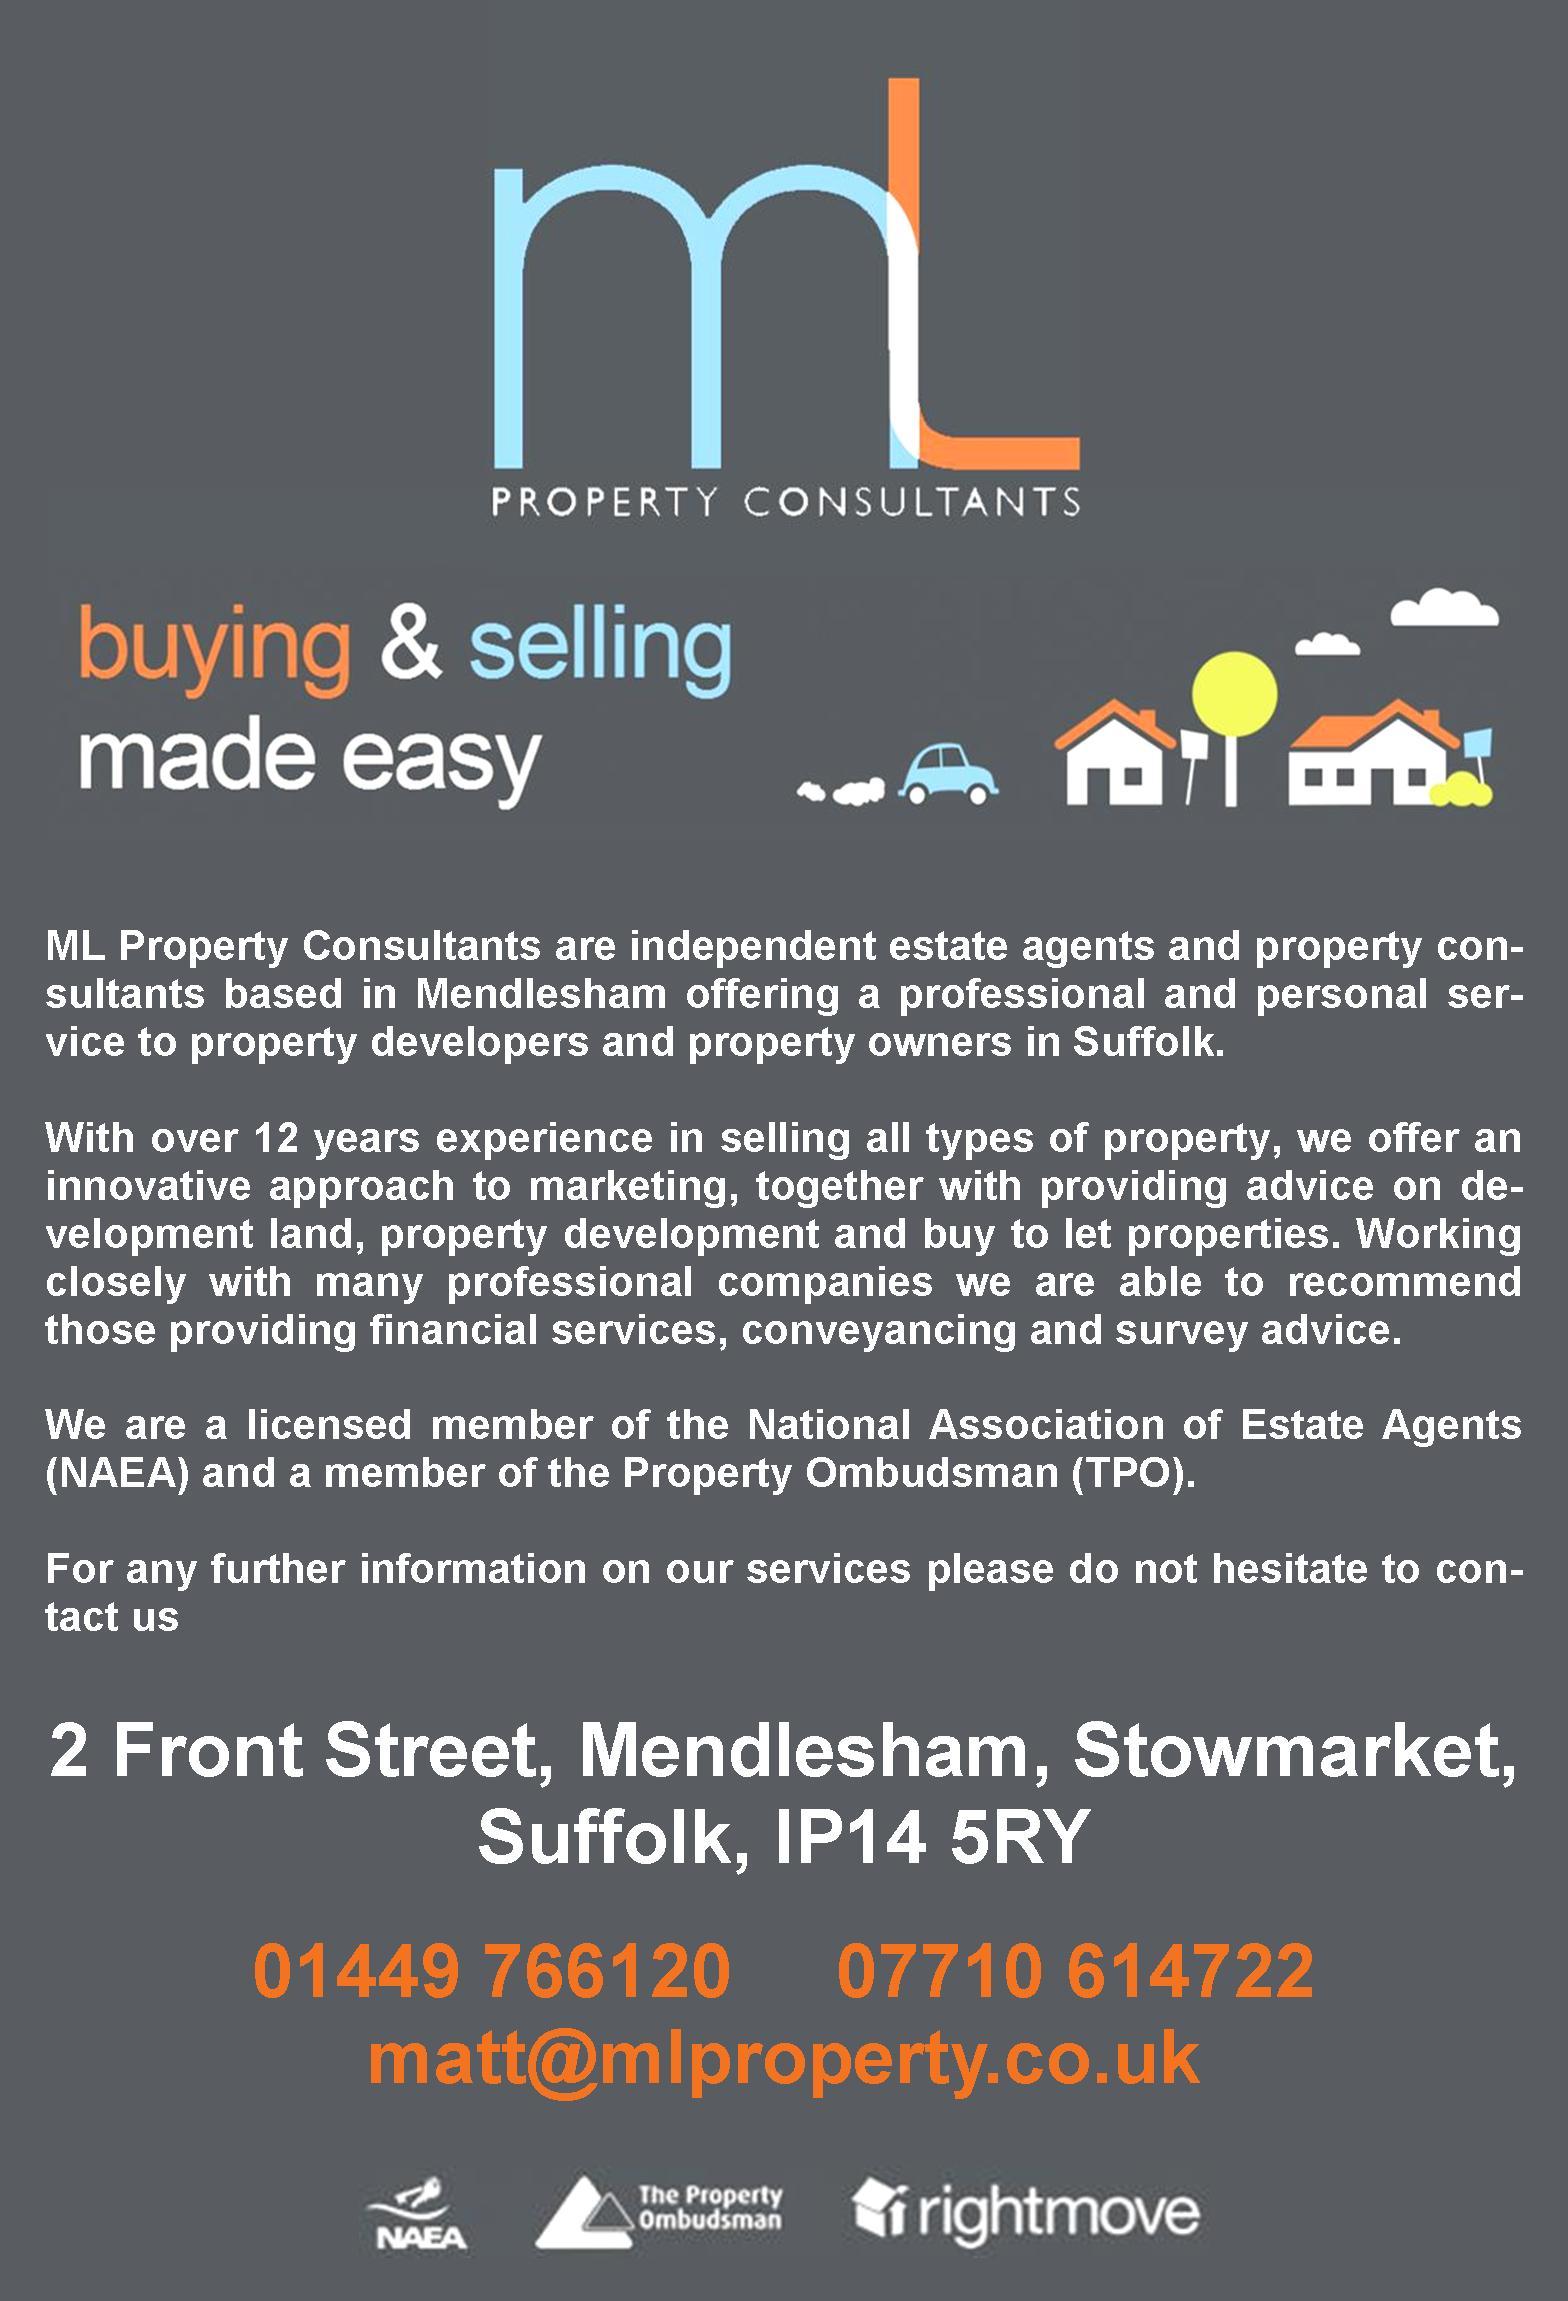 M L Property Consultants